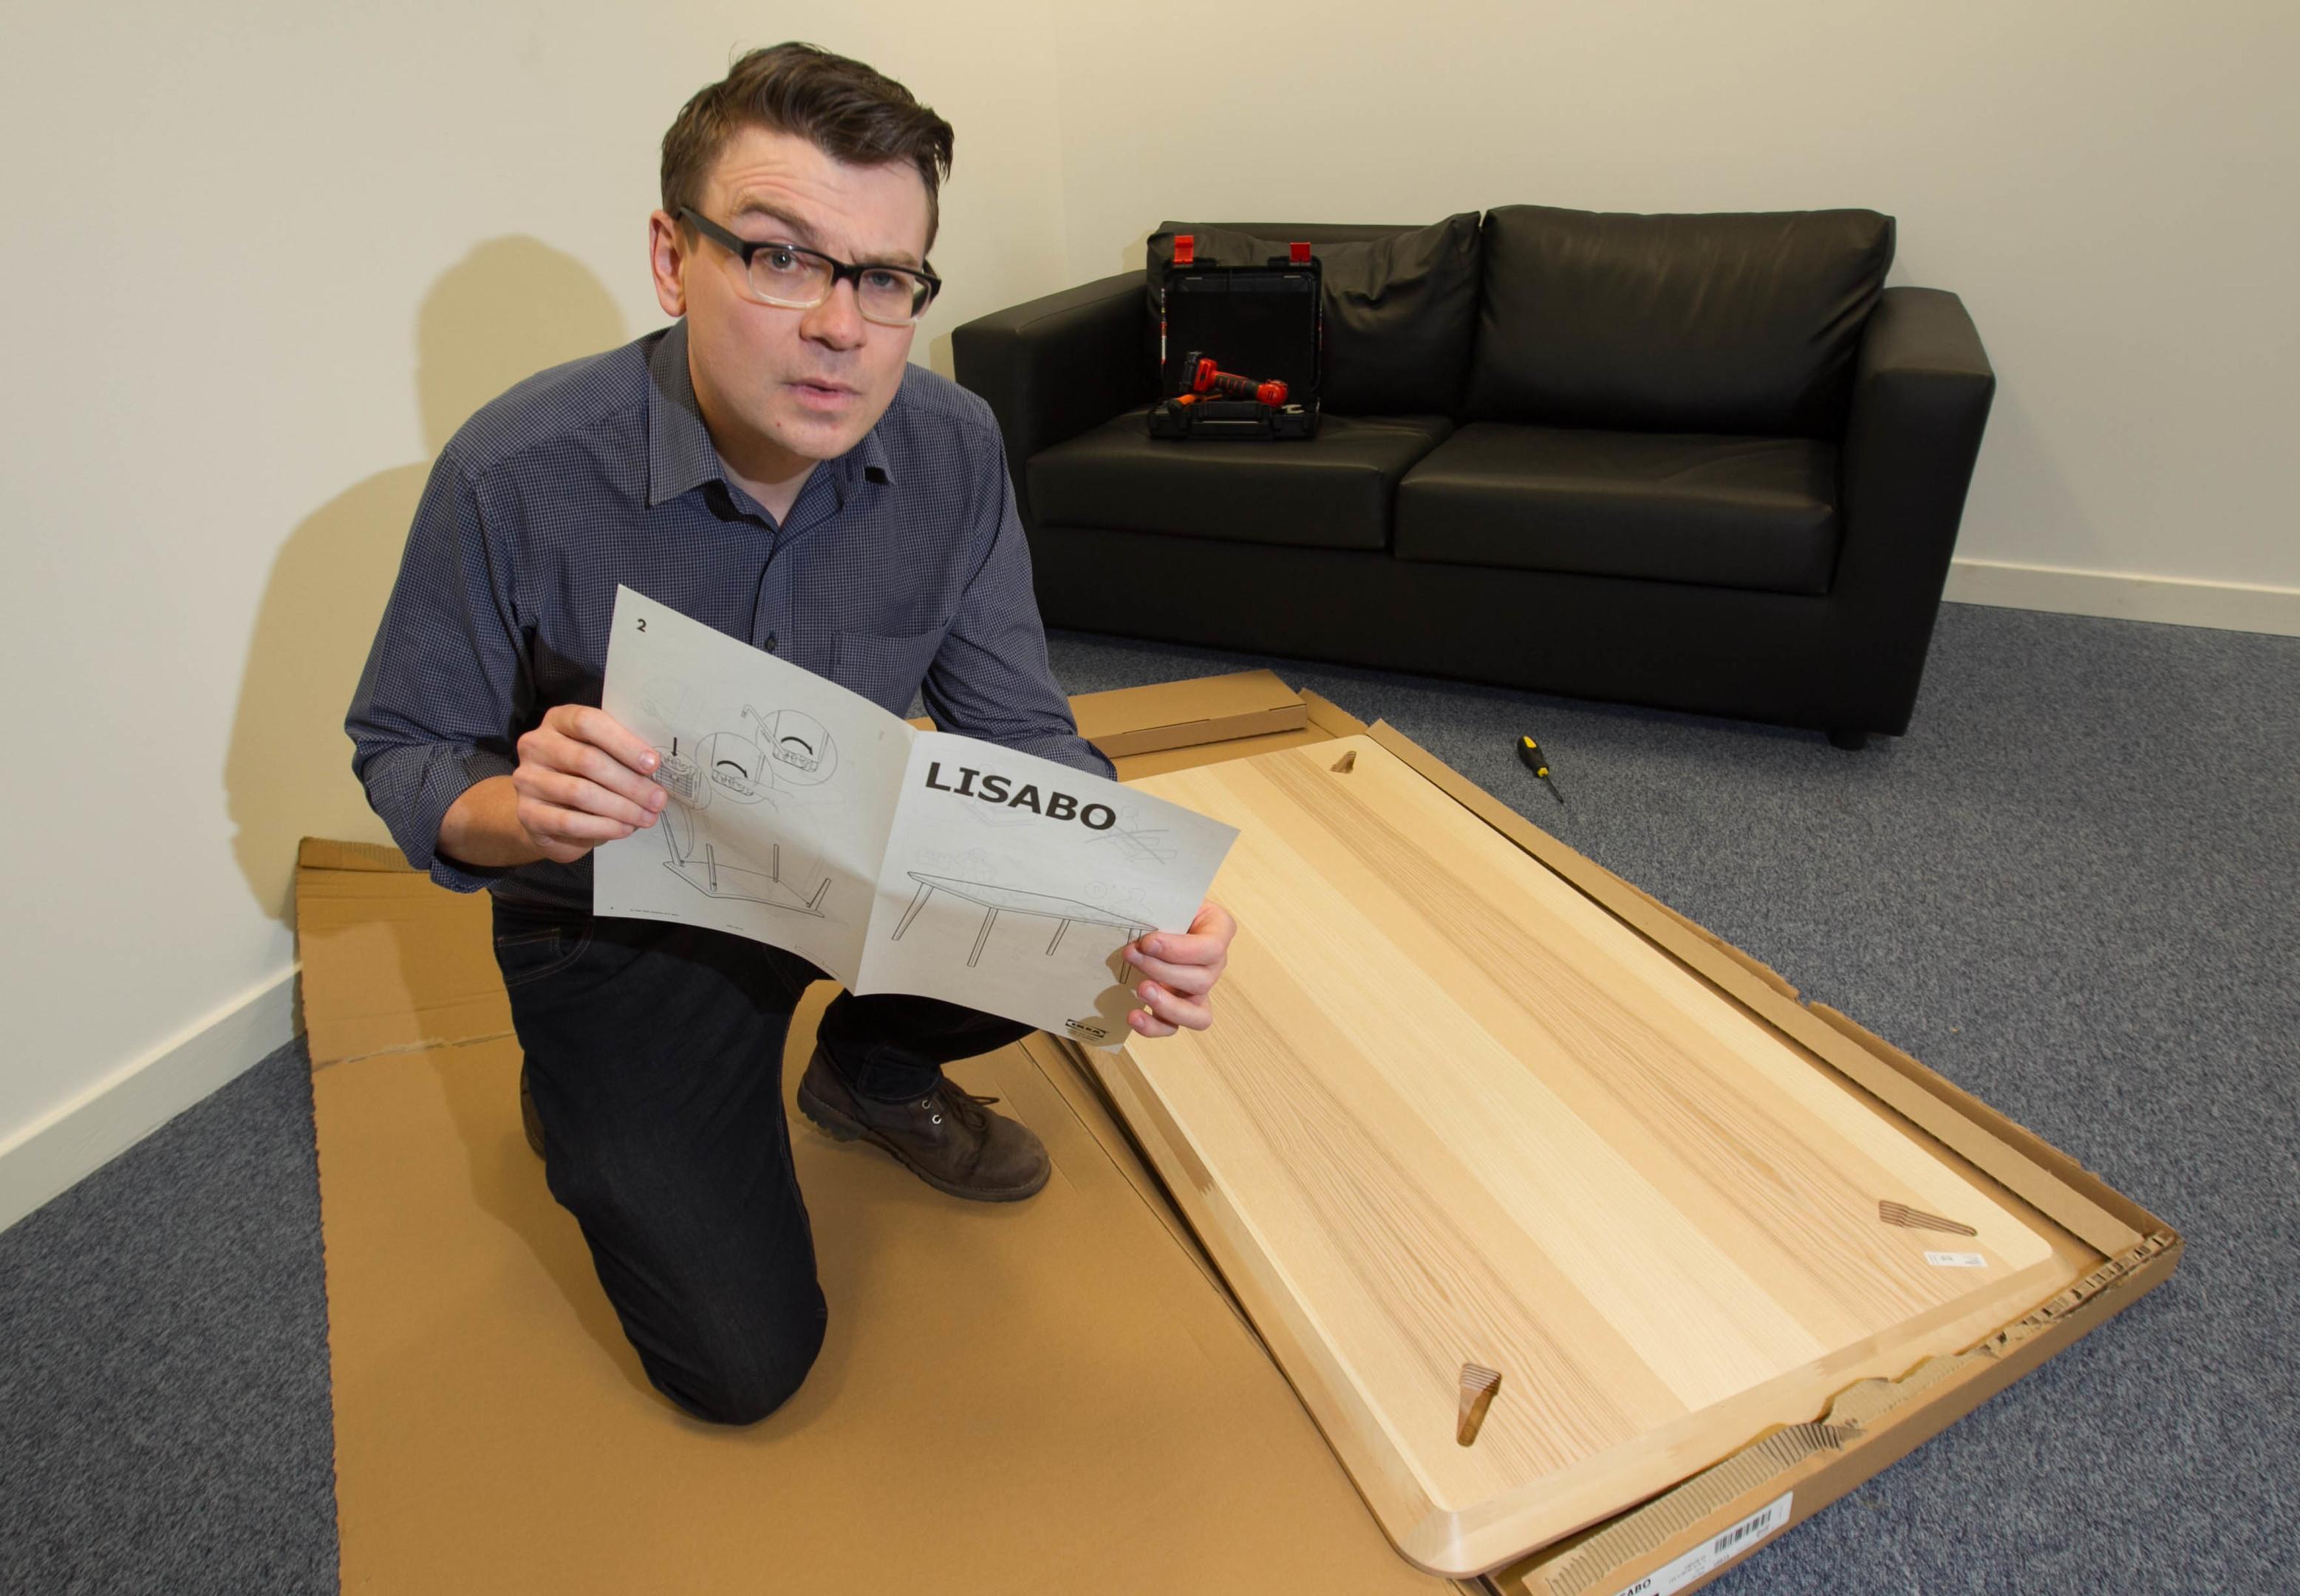 Reporter Stevie Gallacher builds an ikea table in under 10mins. (Chris Austin)